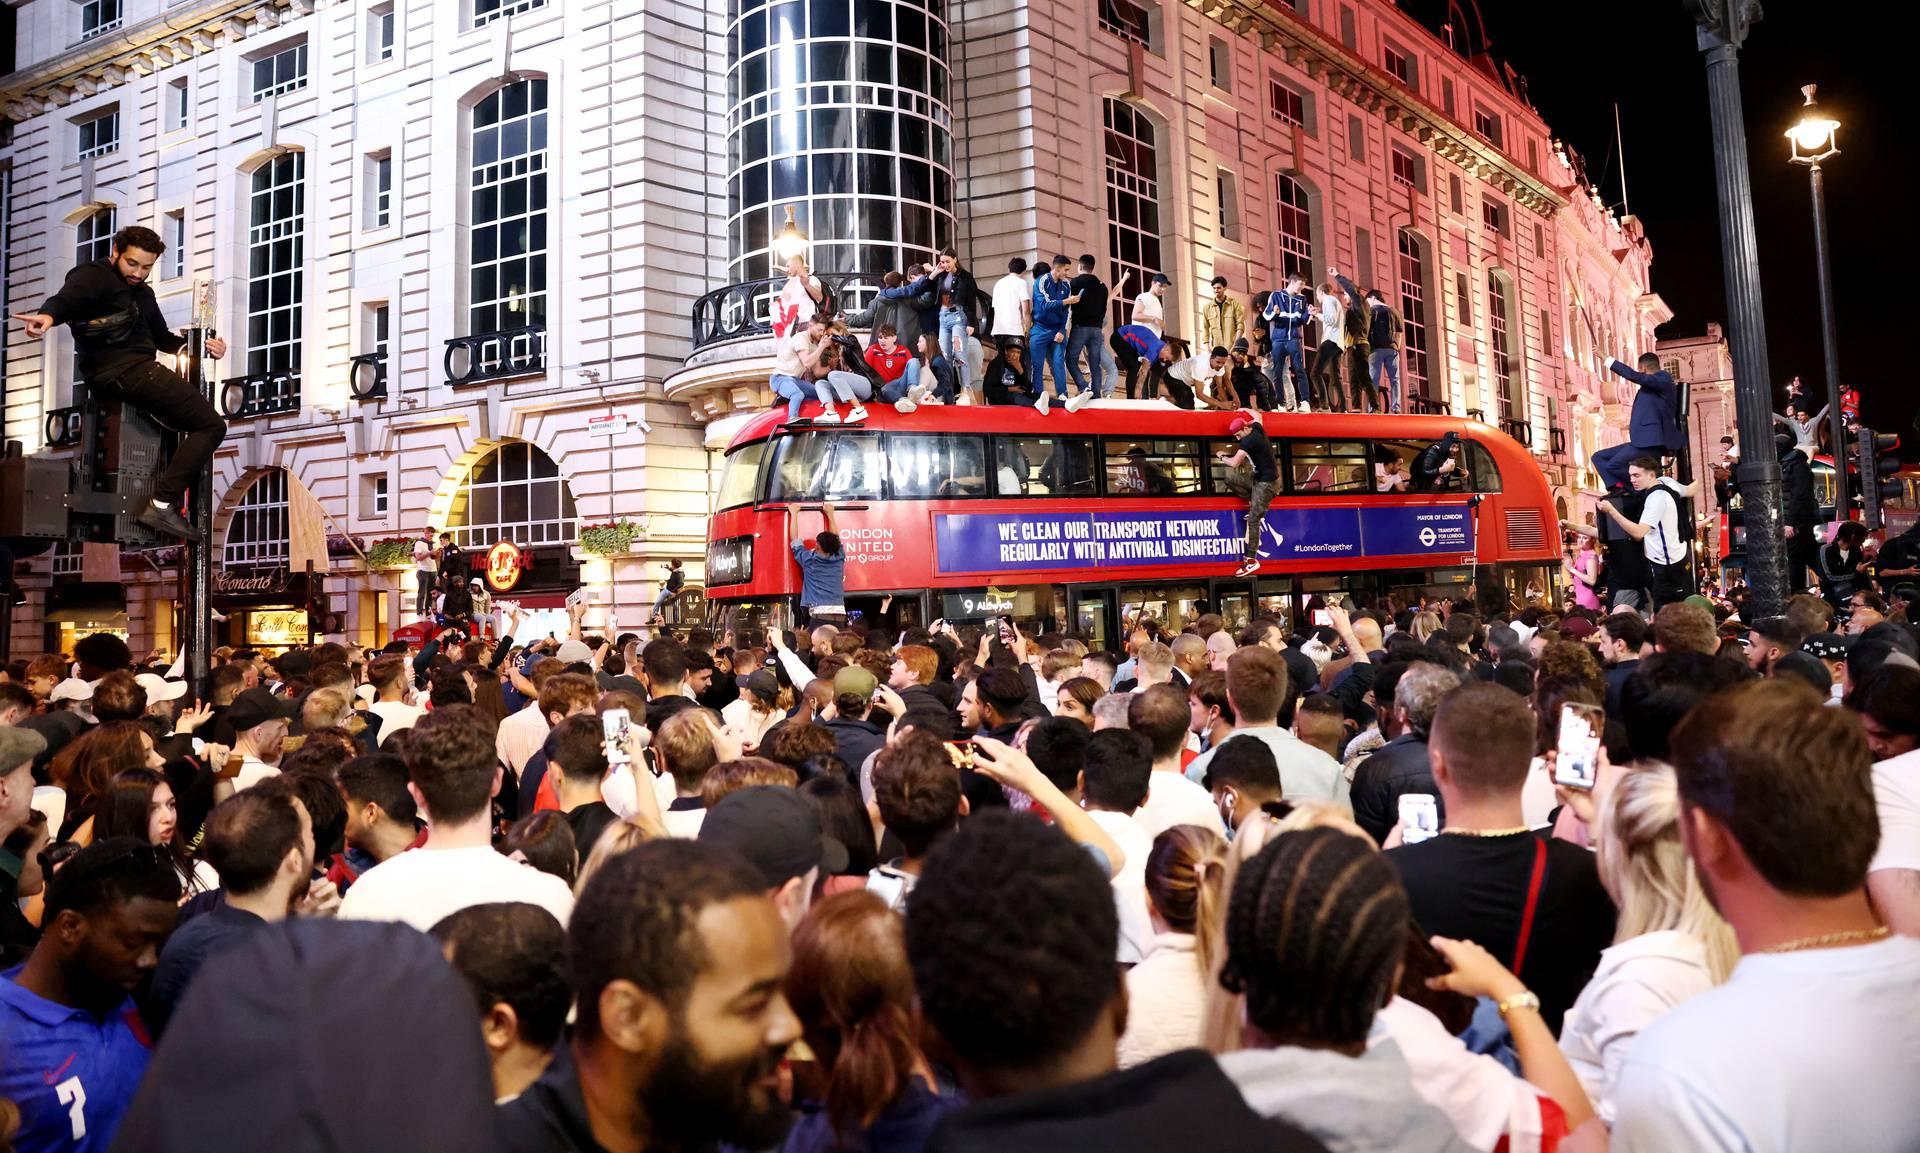 Euro 2020 - Fans gather for England v Denmark